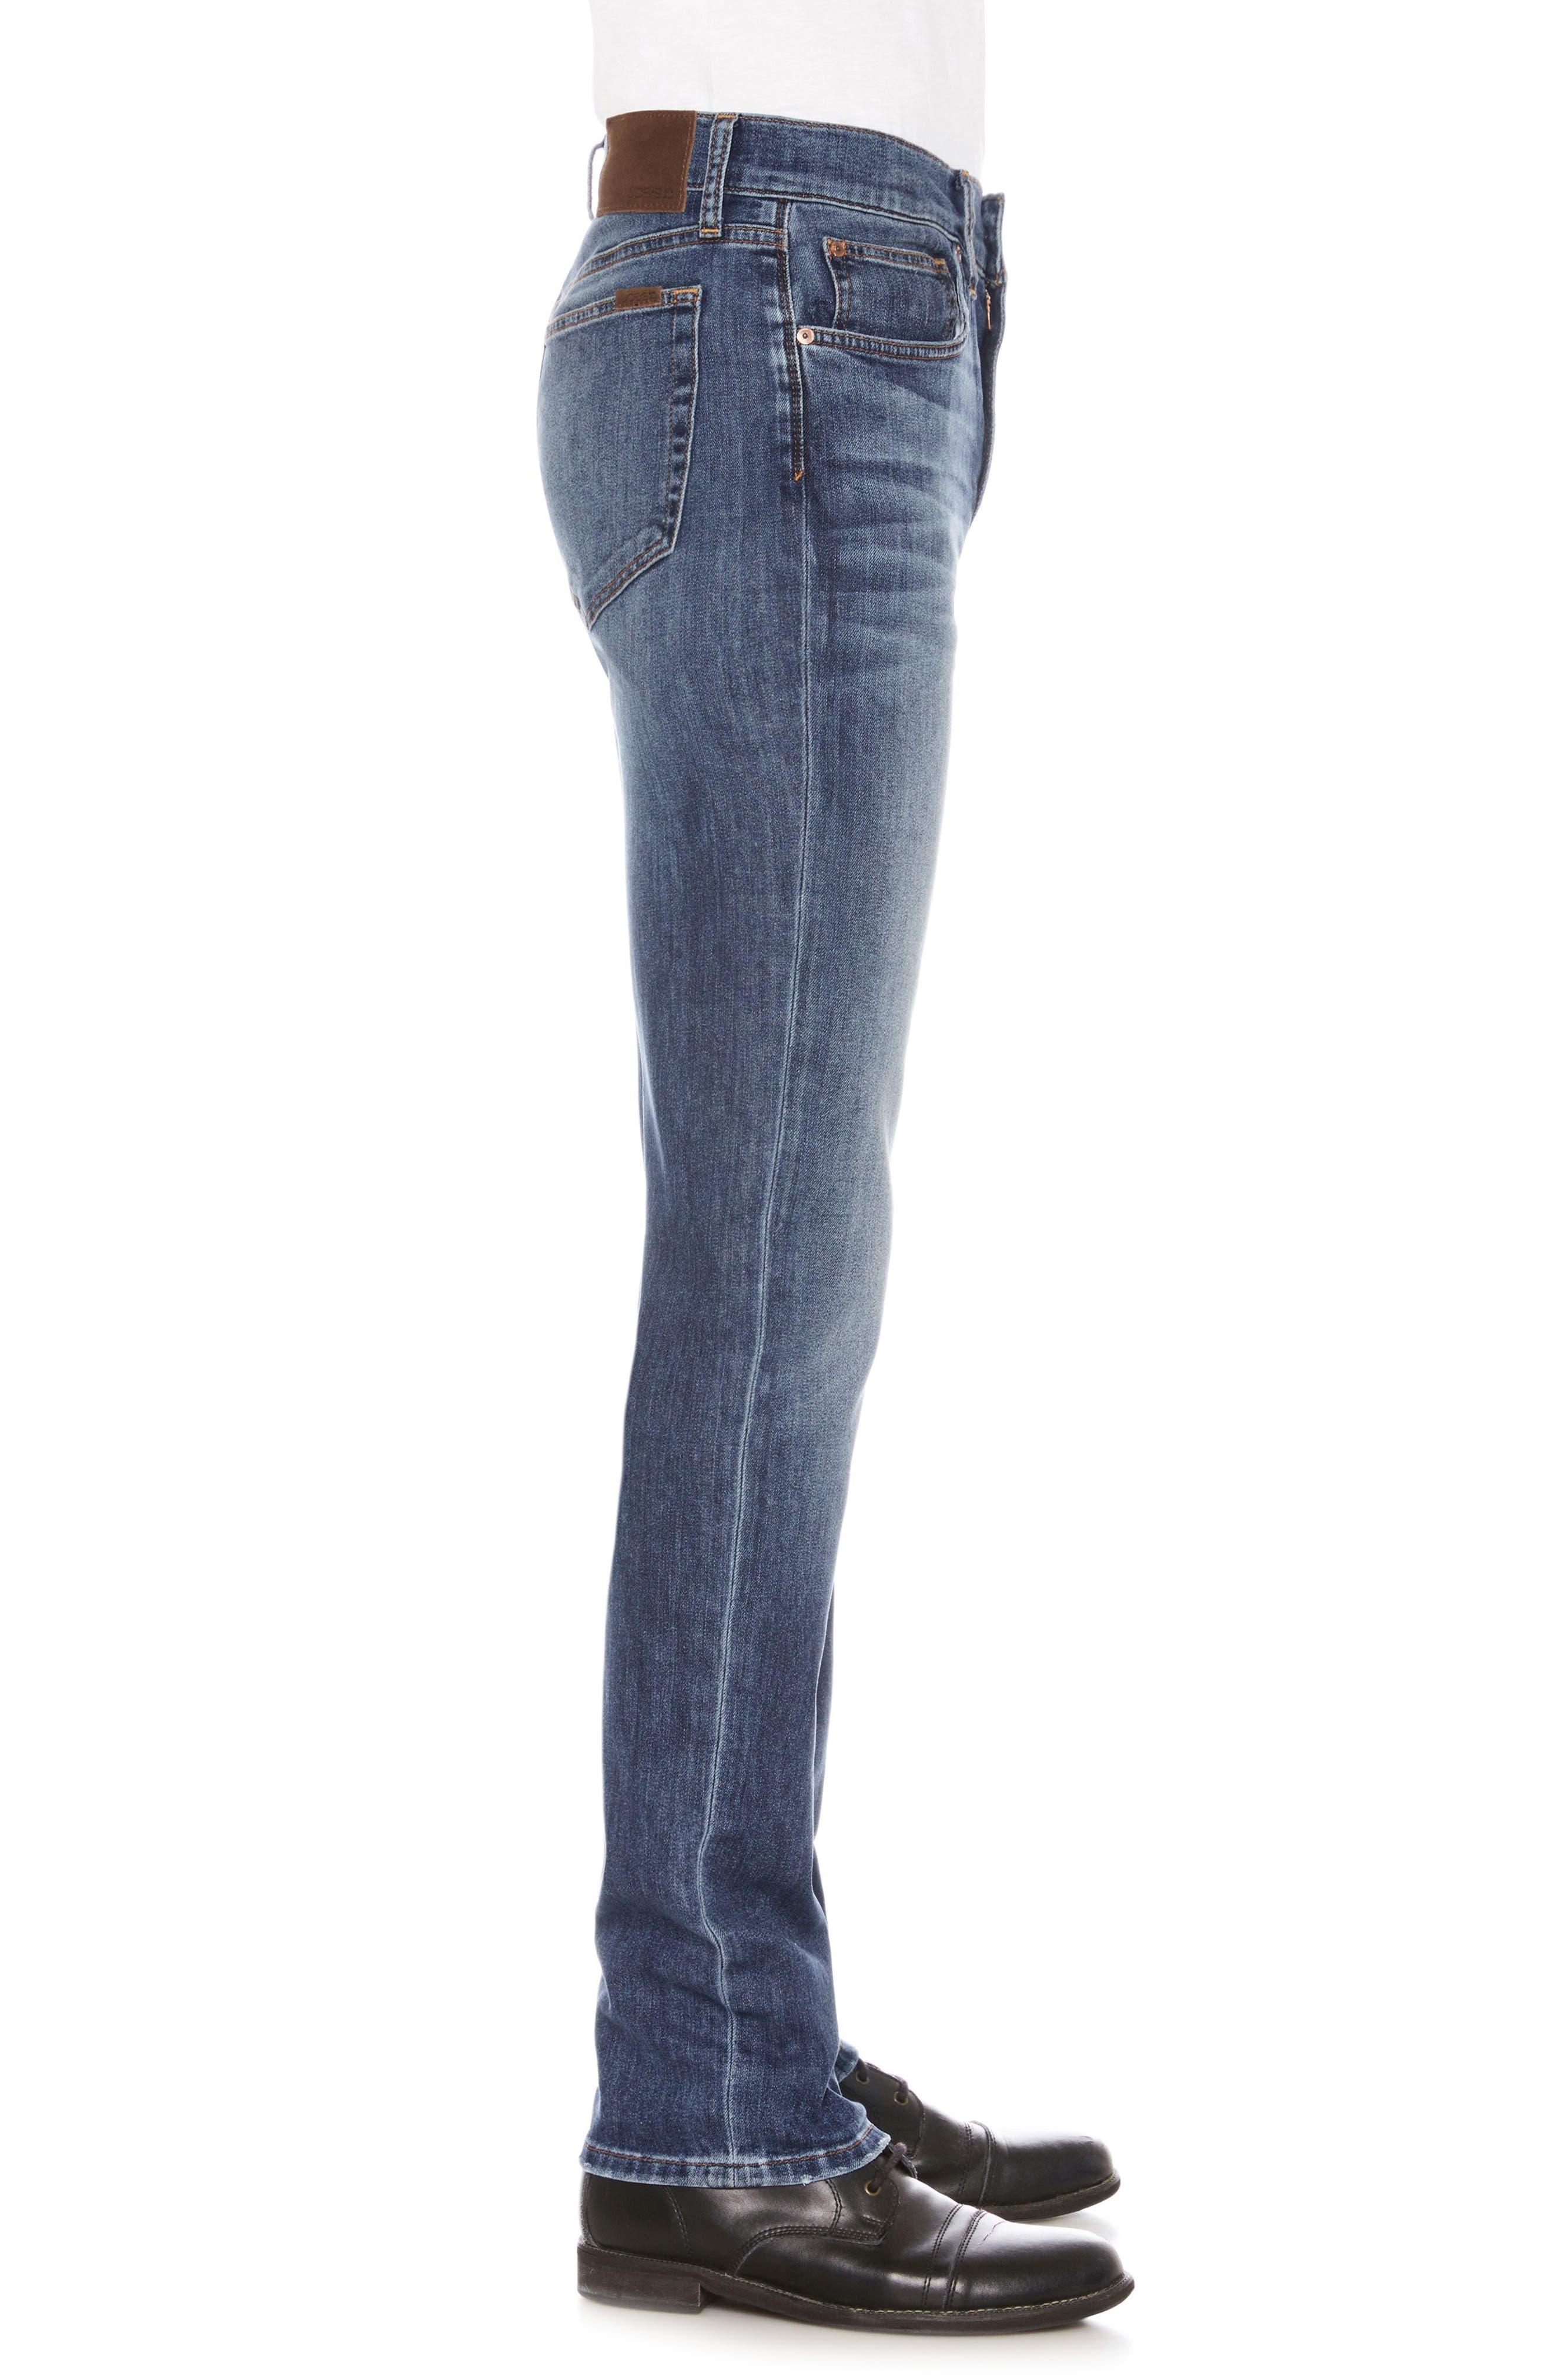 Brixton Slim Straight Leg Jeans,                             Alternate thumbnail 3, color,                             410